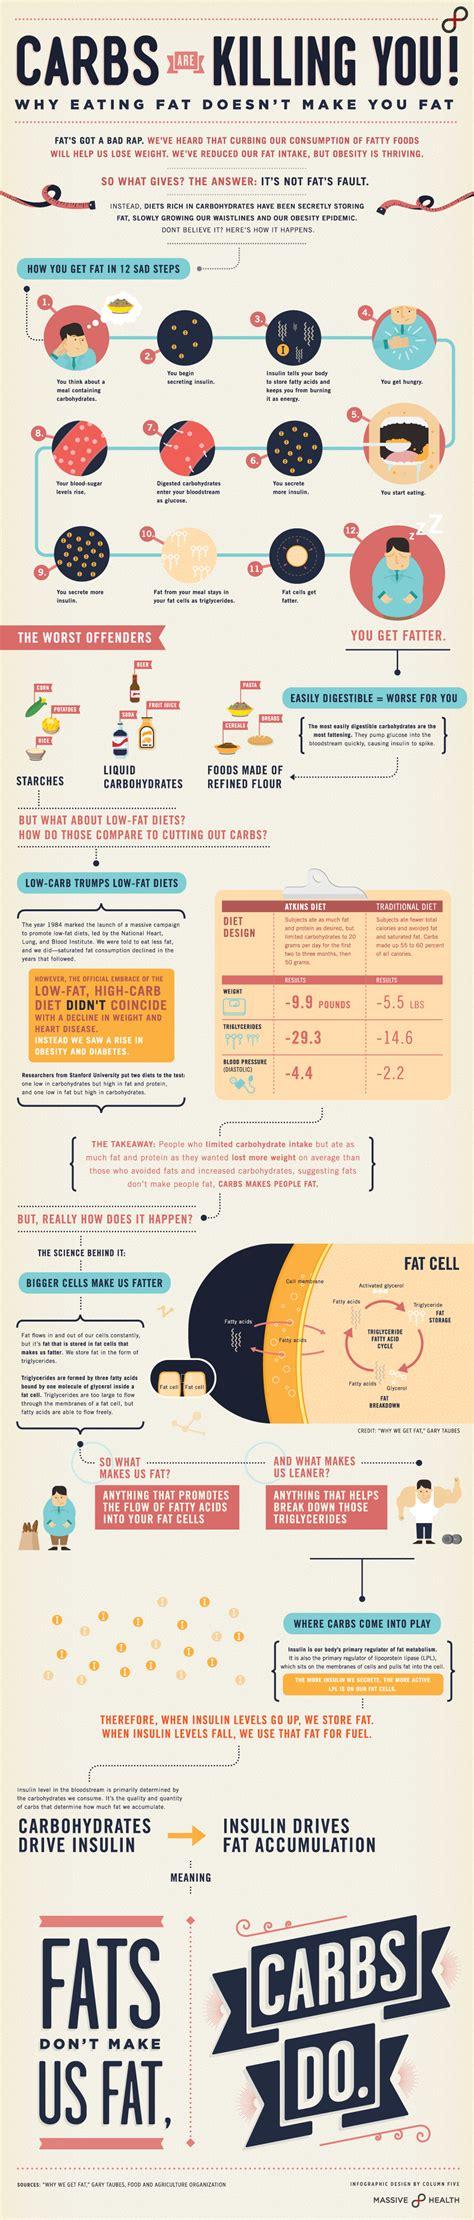 adkins diet info picture 11